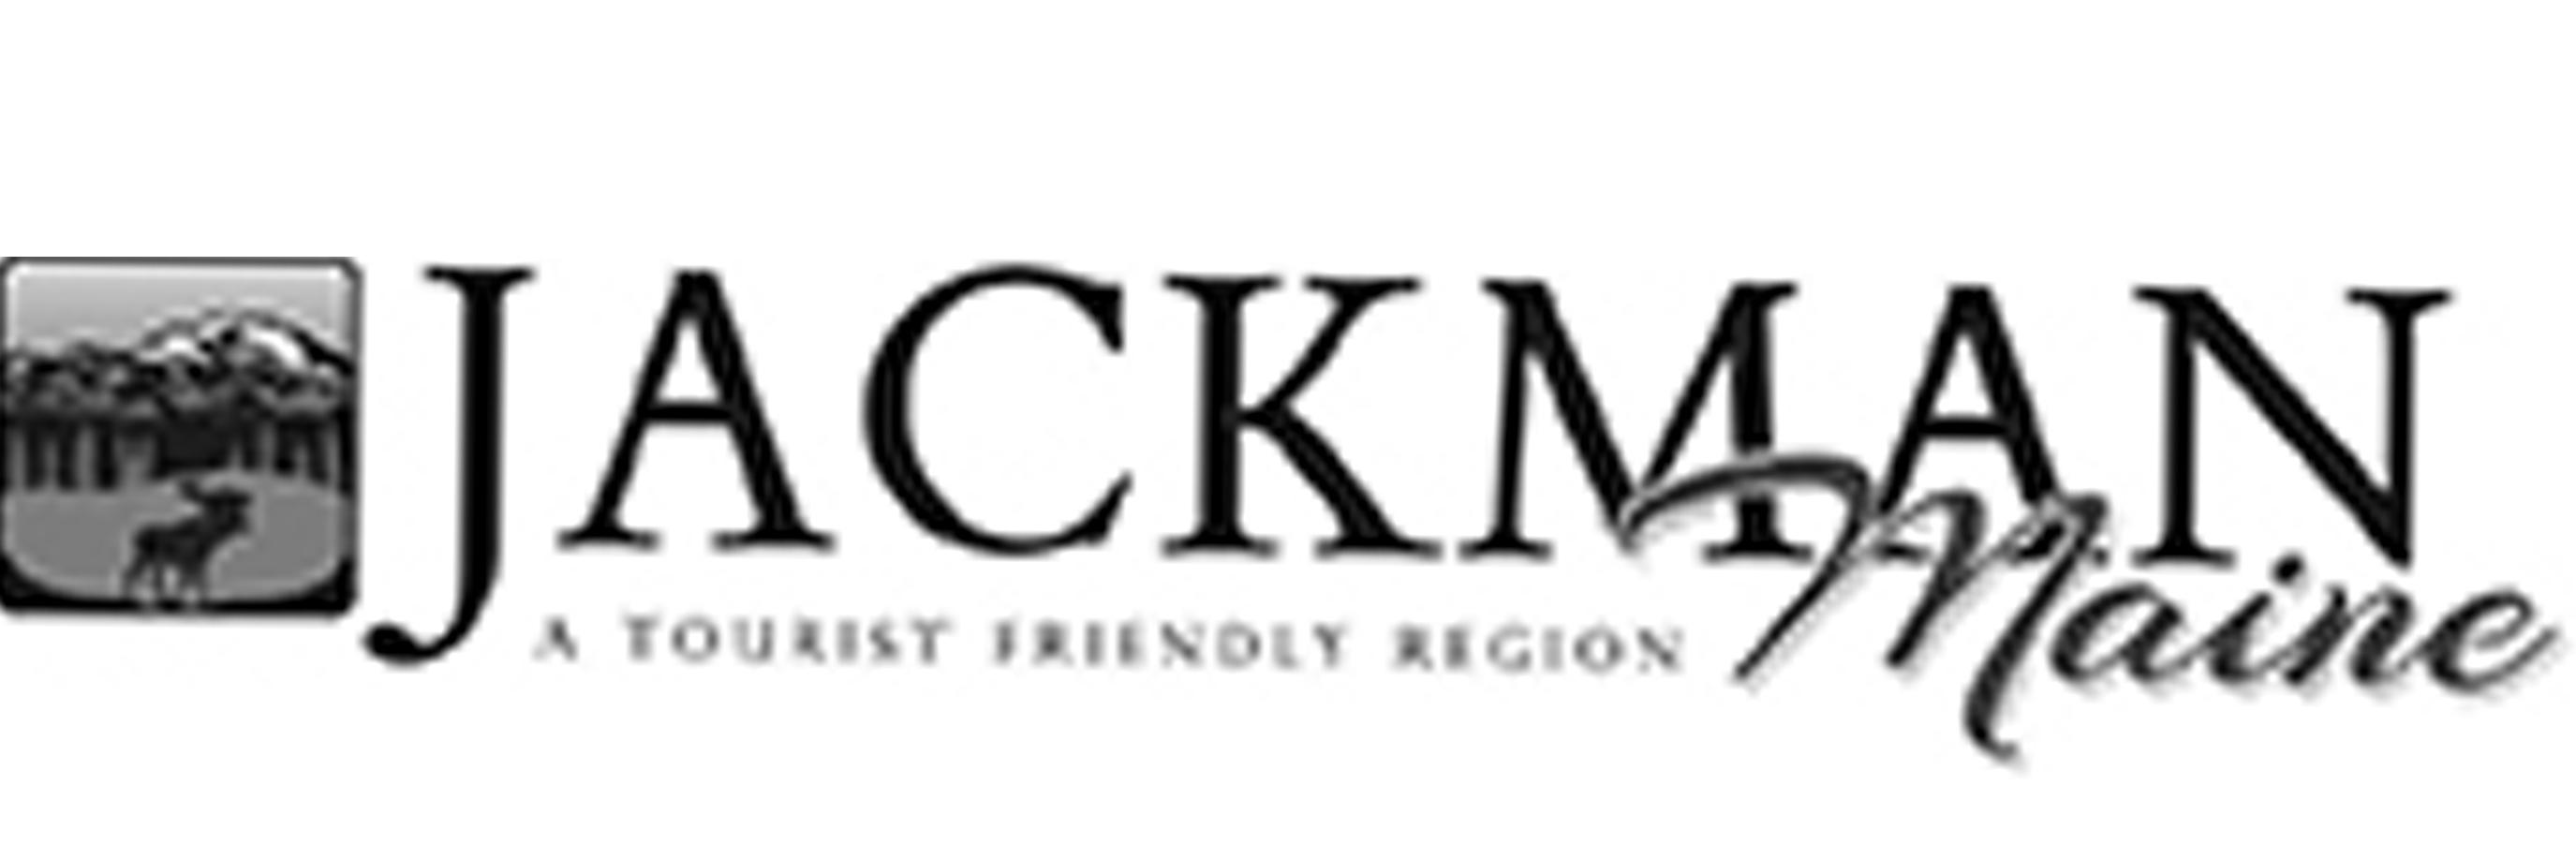 Town of Jackman